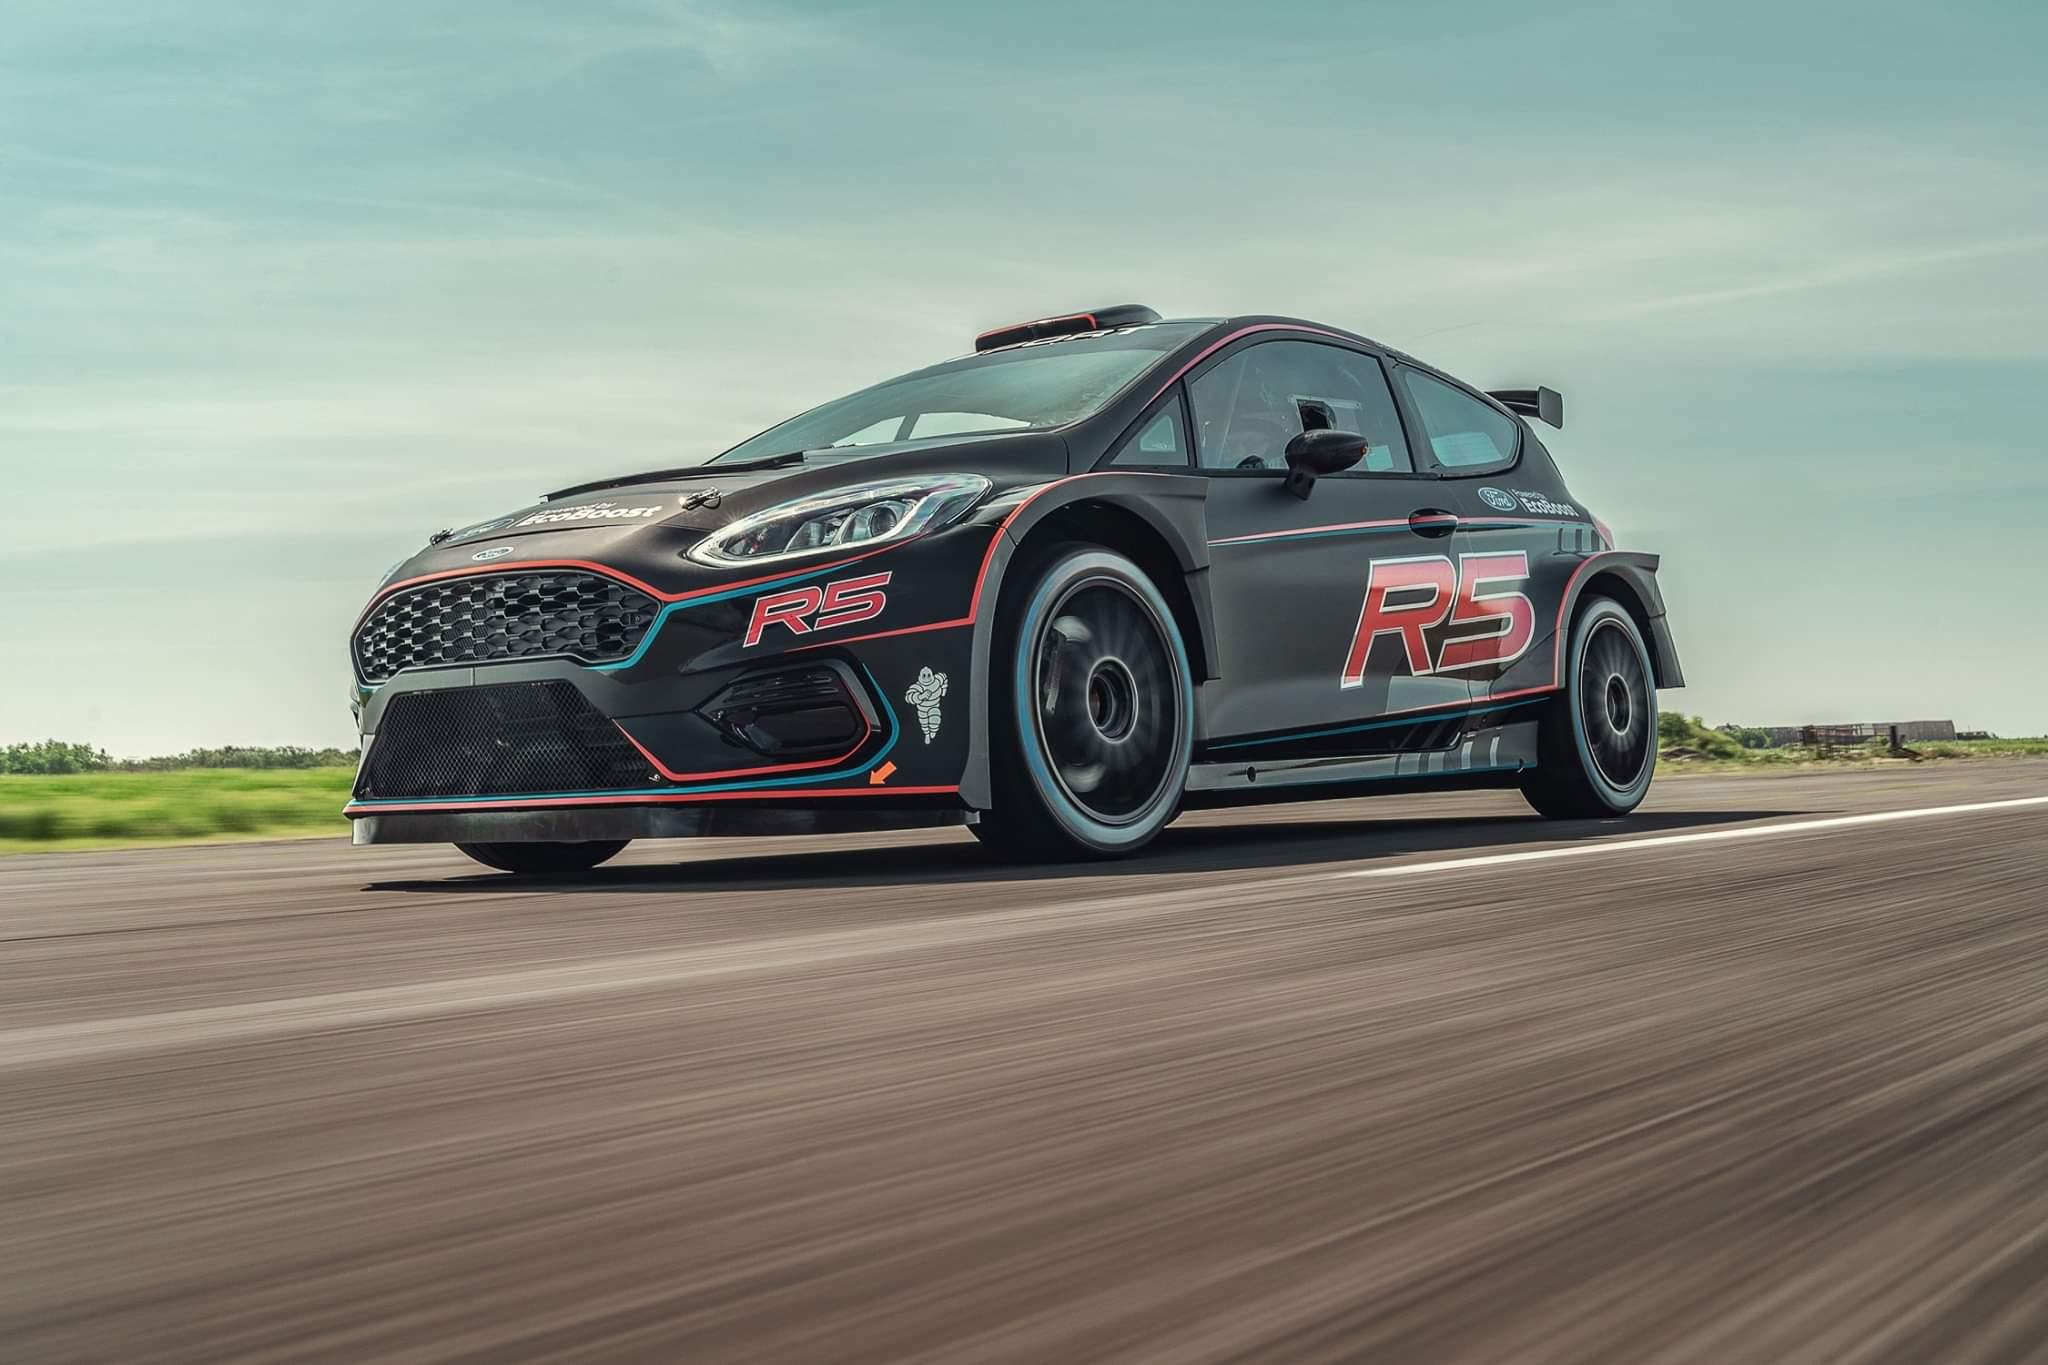 World Rally Championship: Temporada 2019 - Página 25 D8dzAGGXYAULZ1a